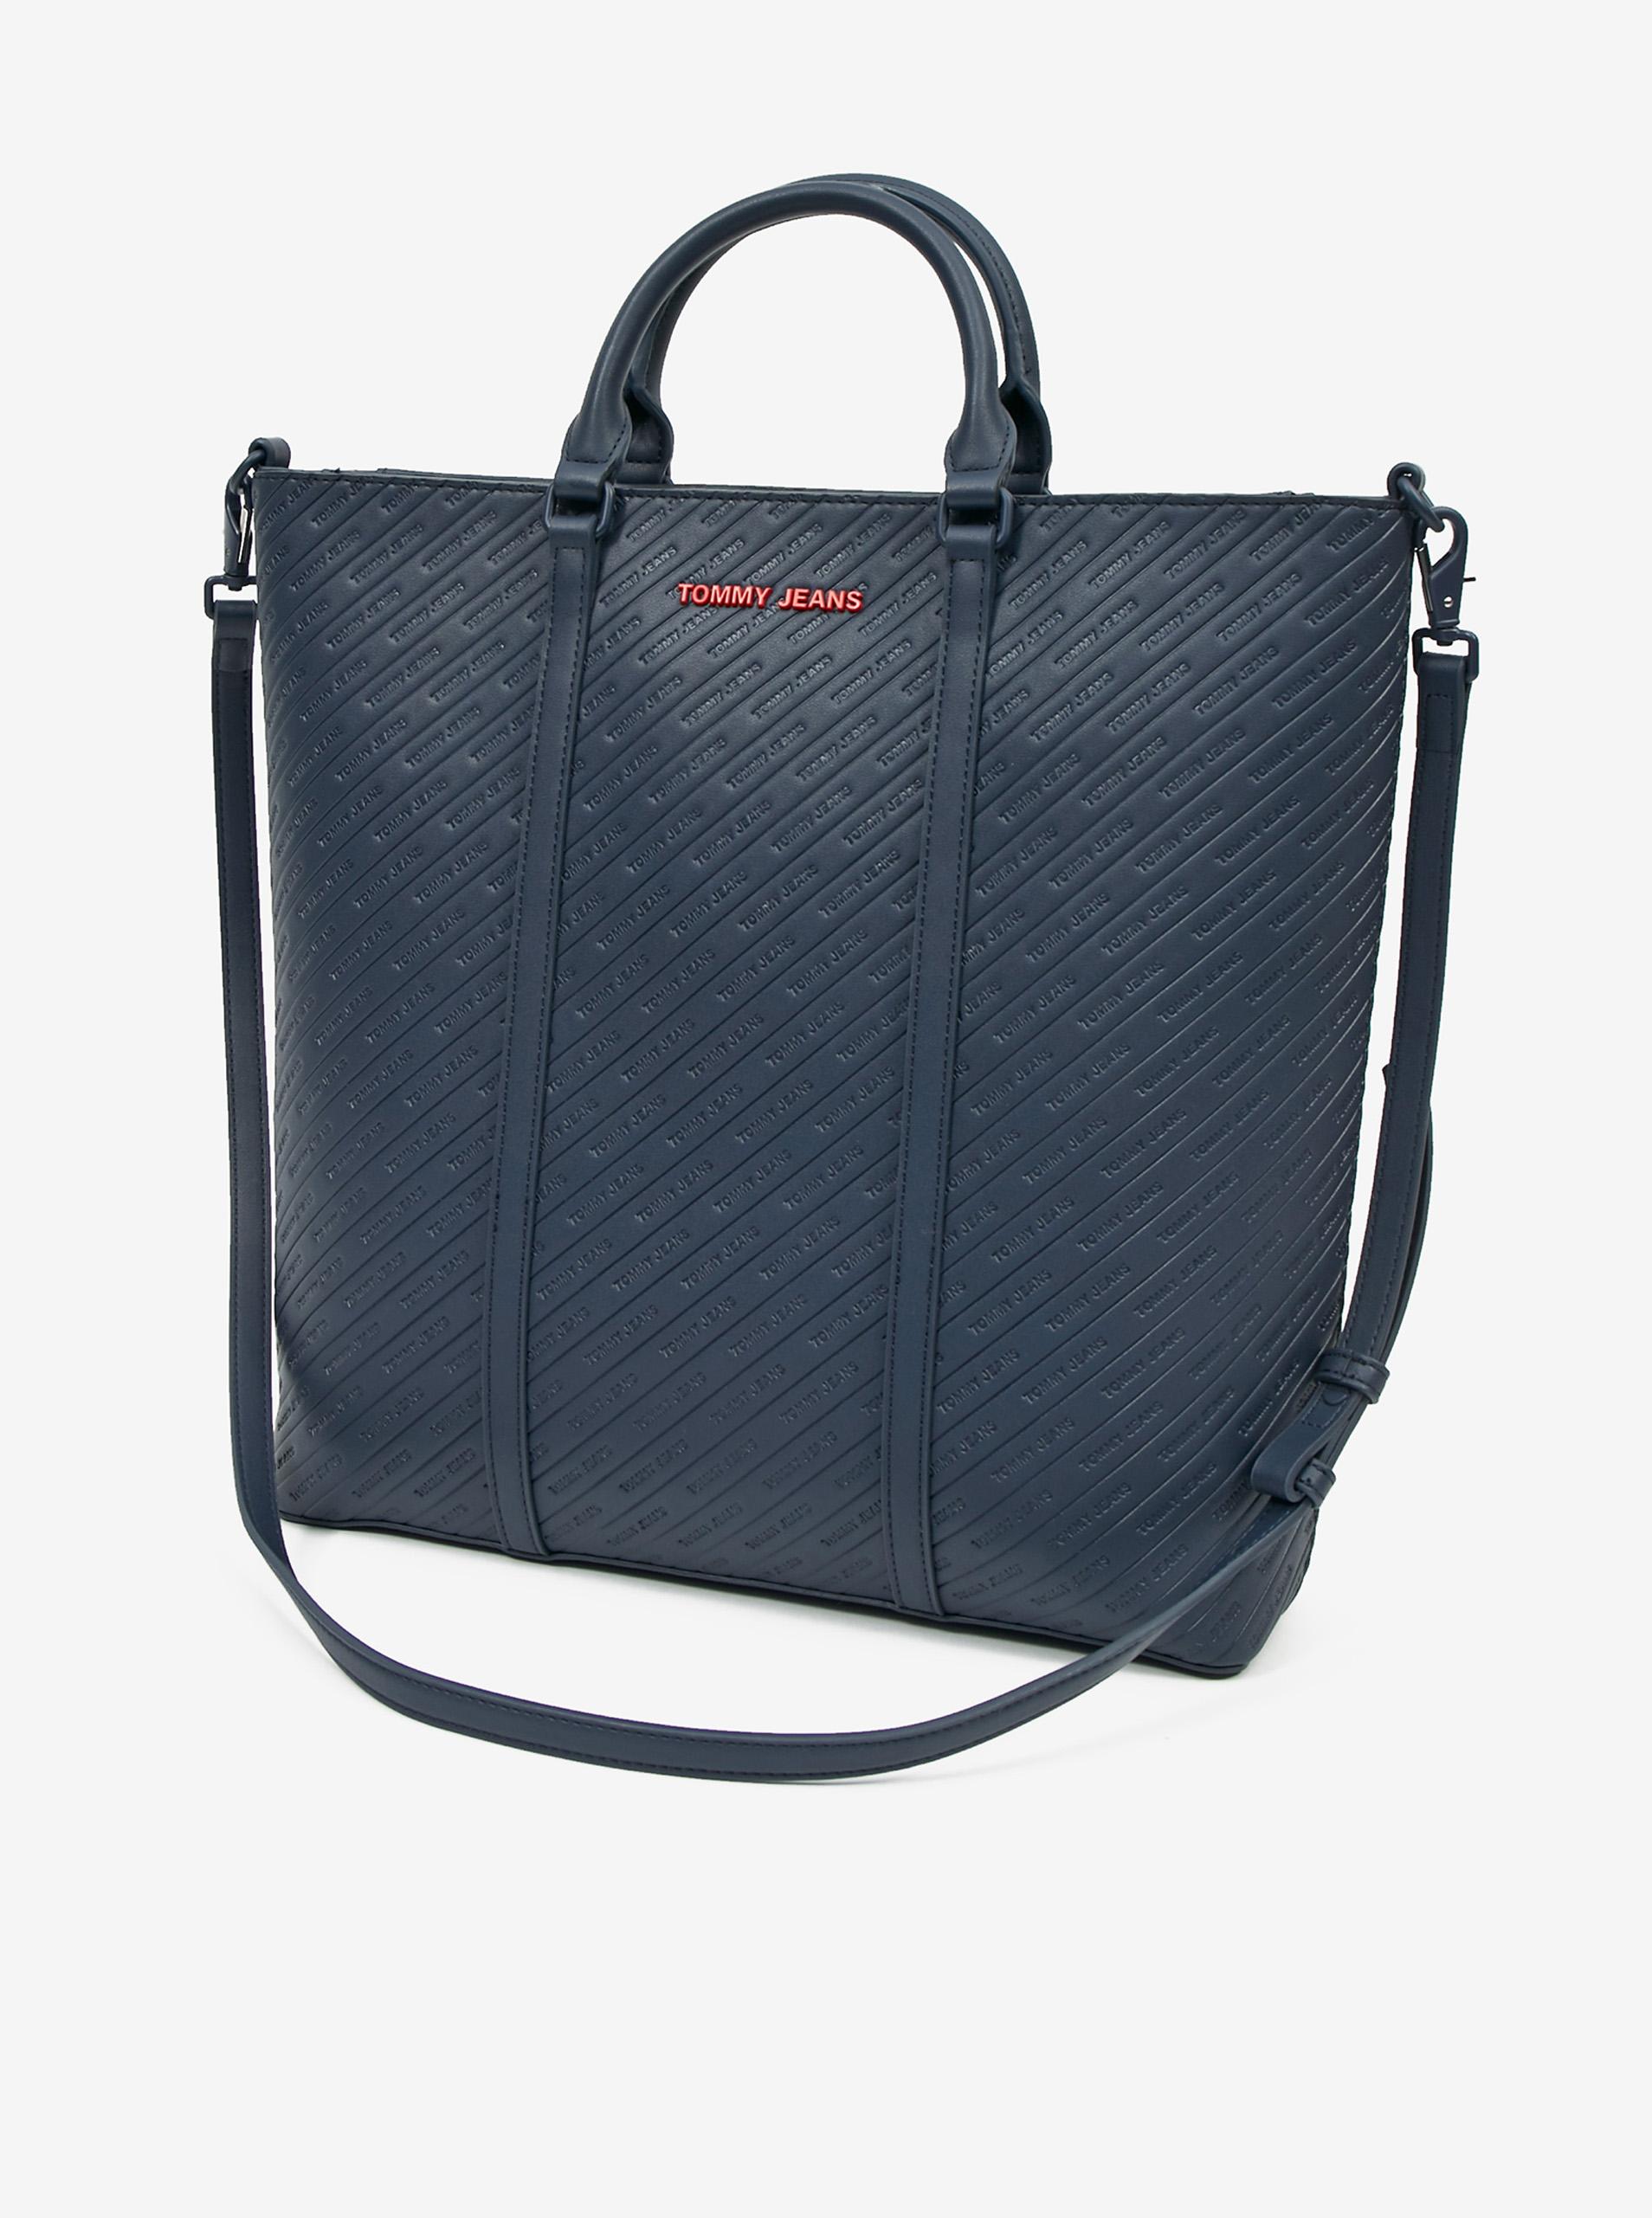 Tommy Hilfiger niebieski torebka